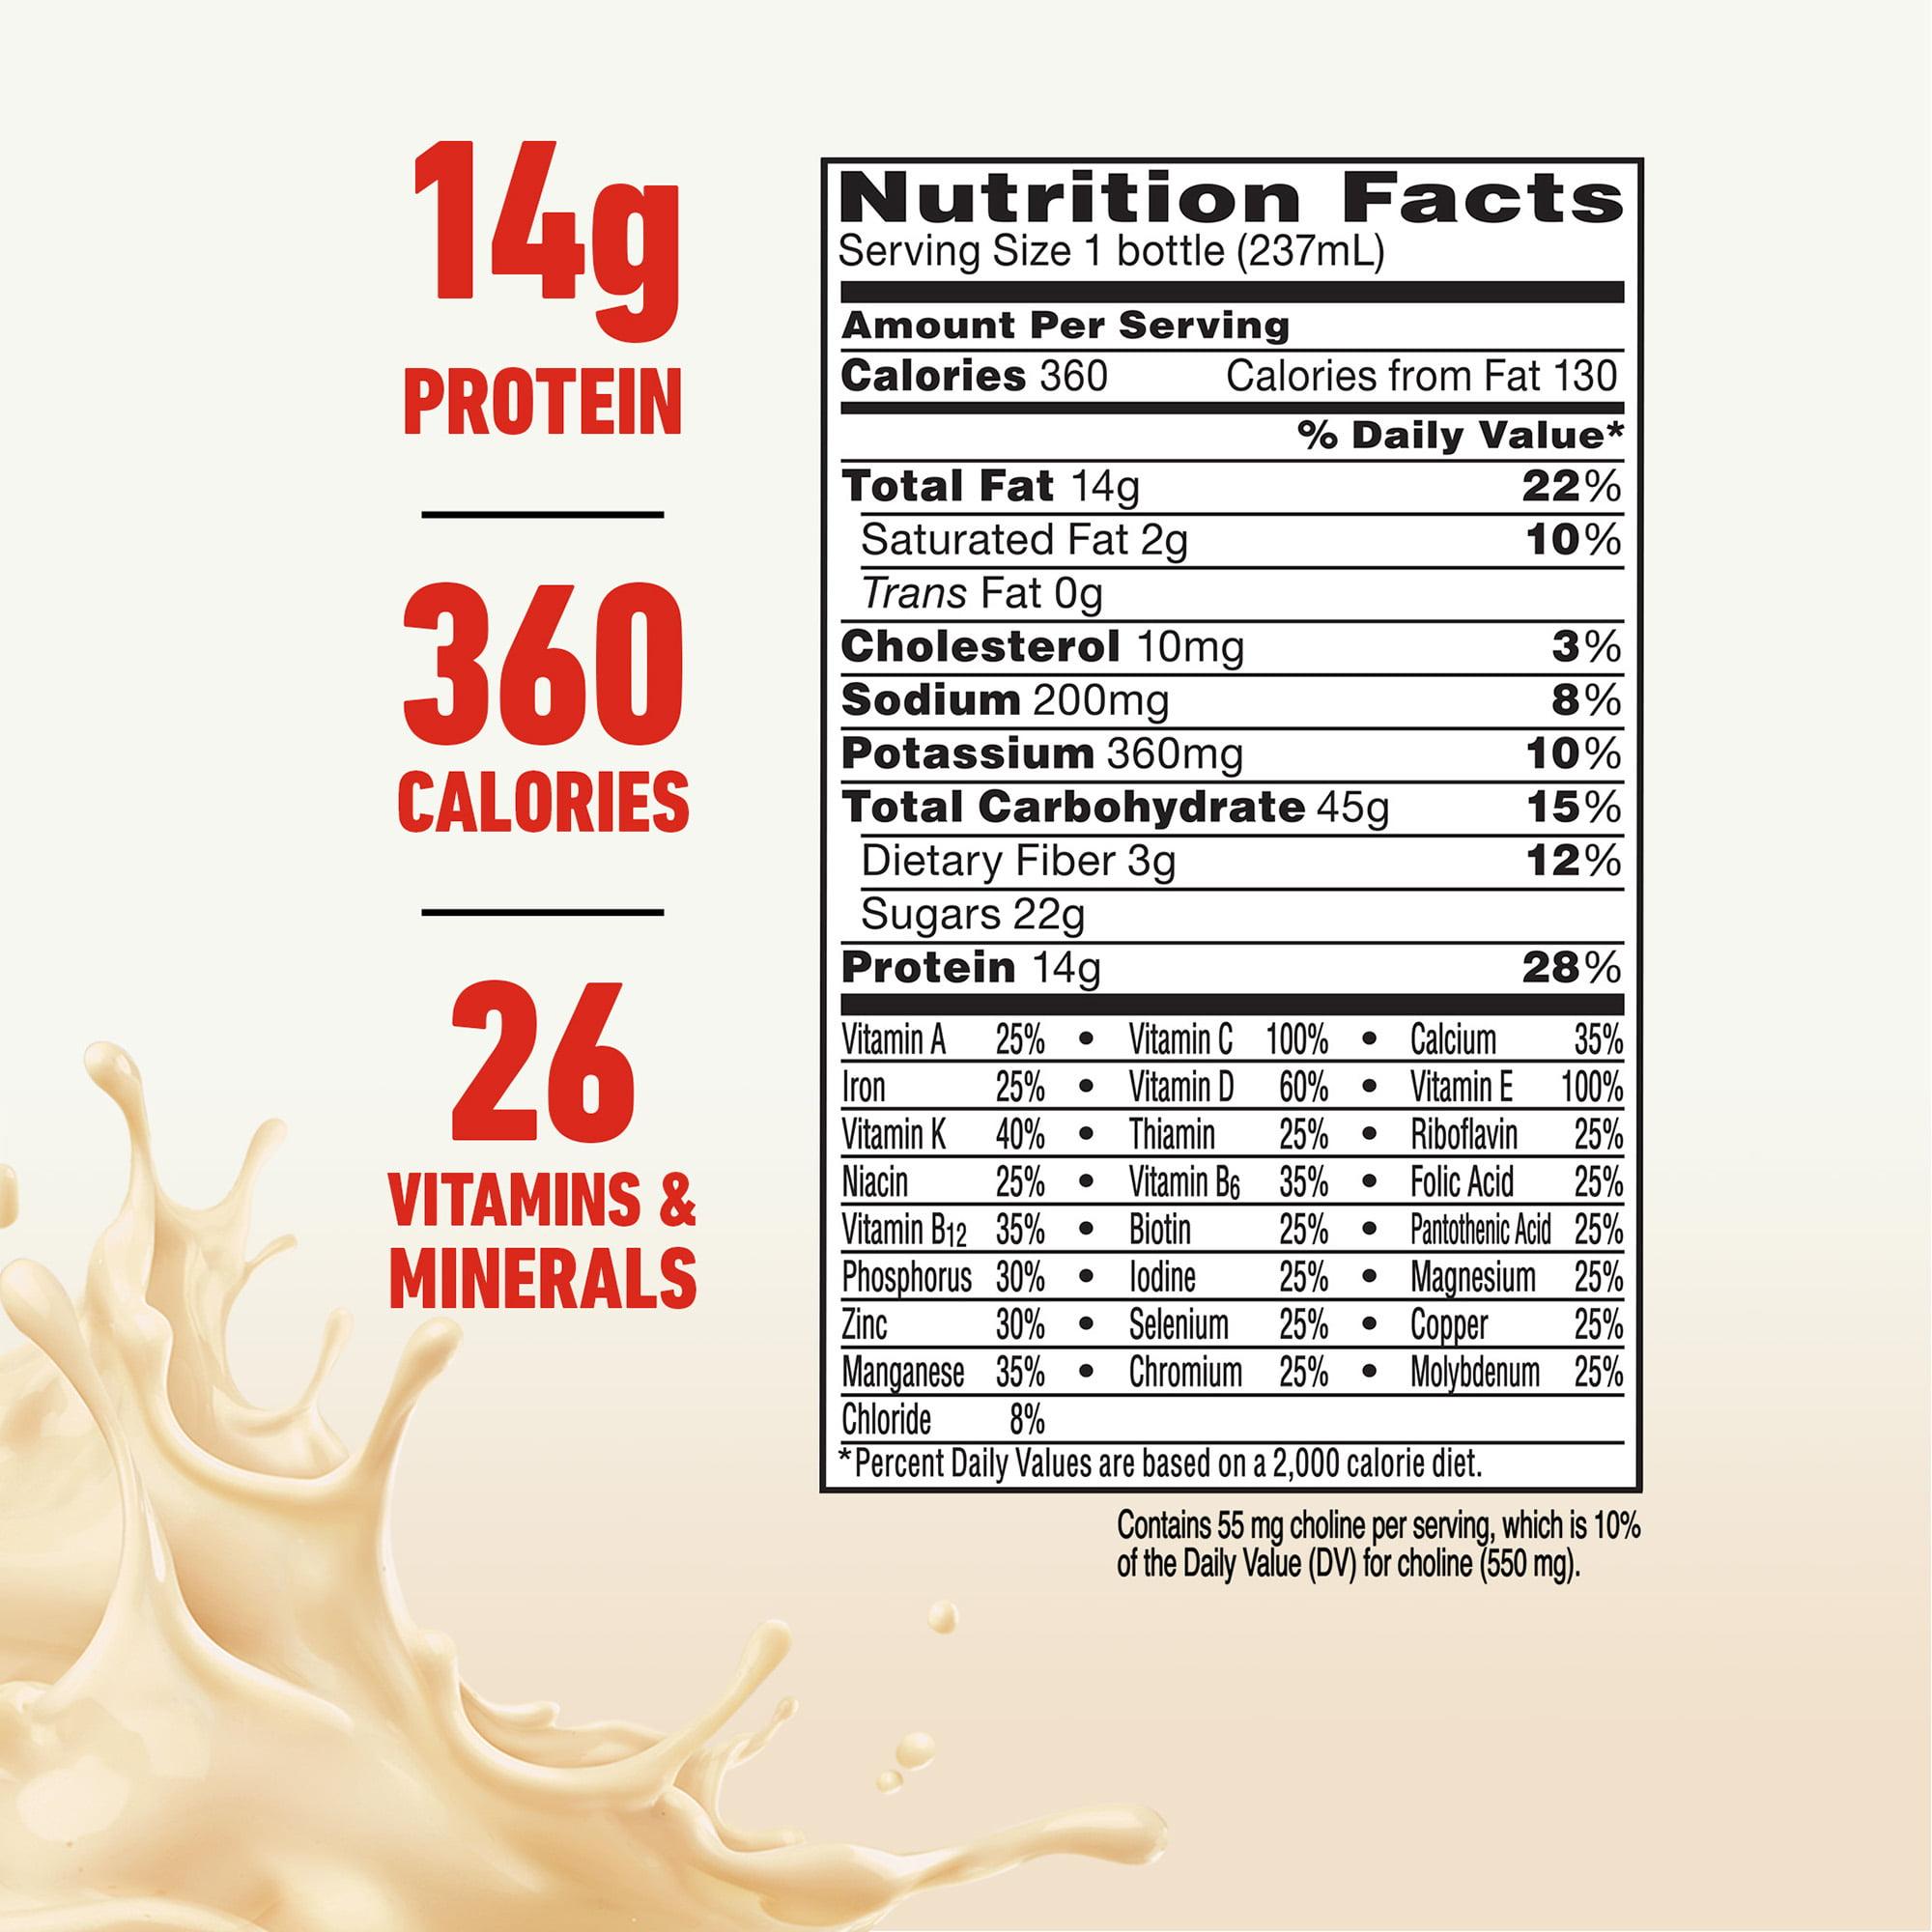 Boost Plus Complete Nutritional Drink, Very Vanilla, 8 fl oz Bottle, 12 Count - Walmart.com